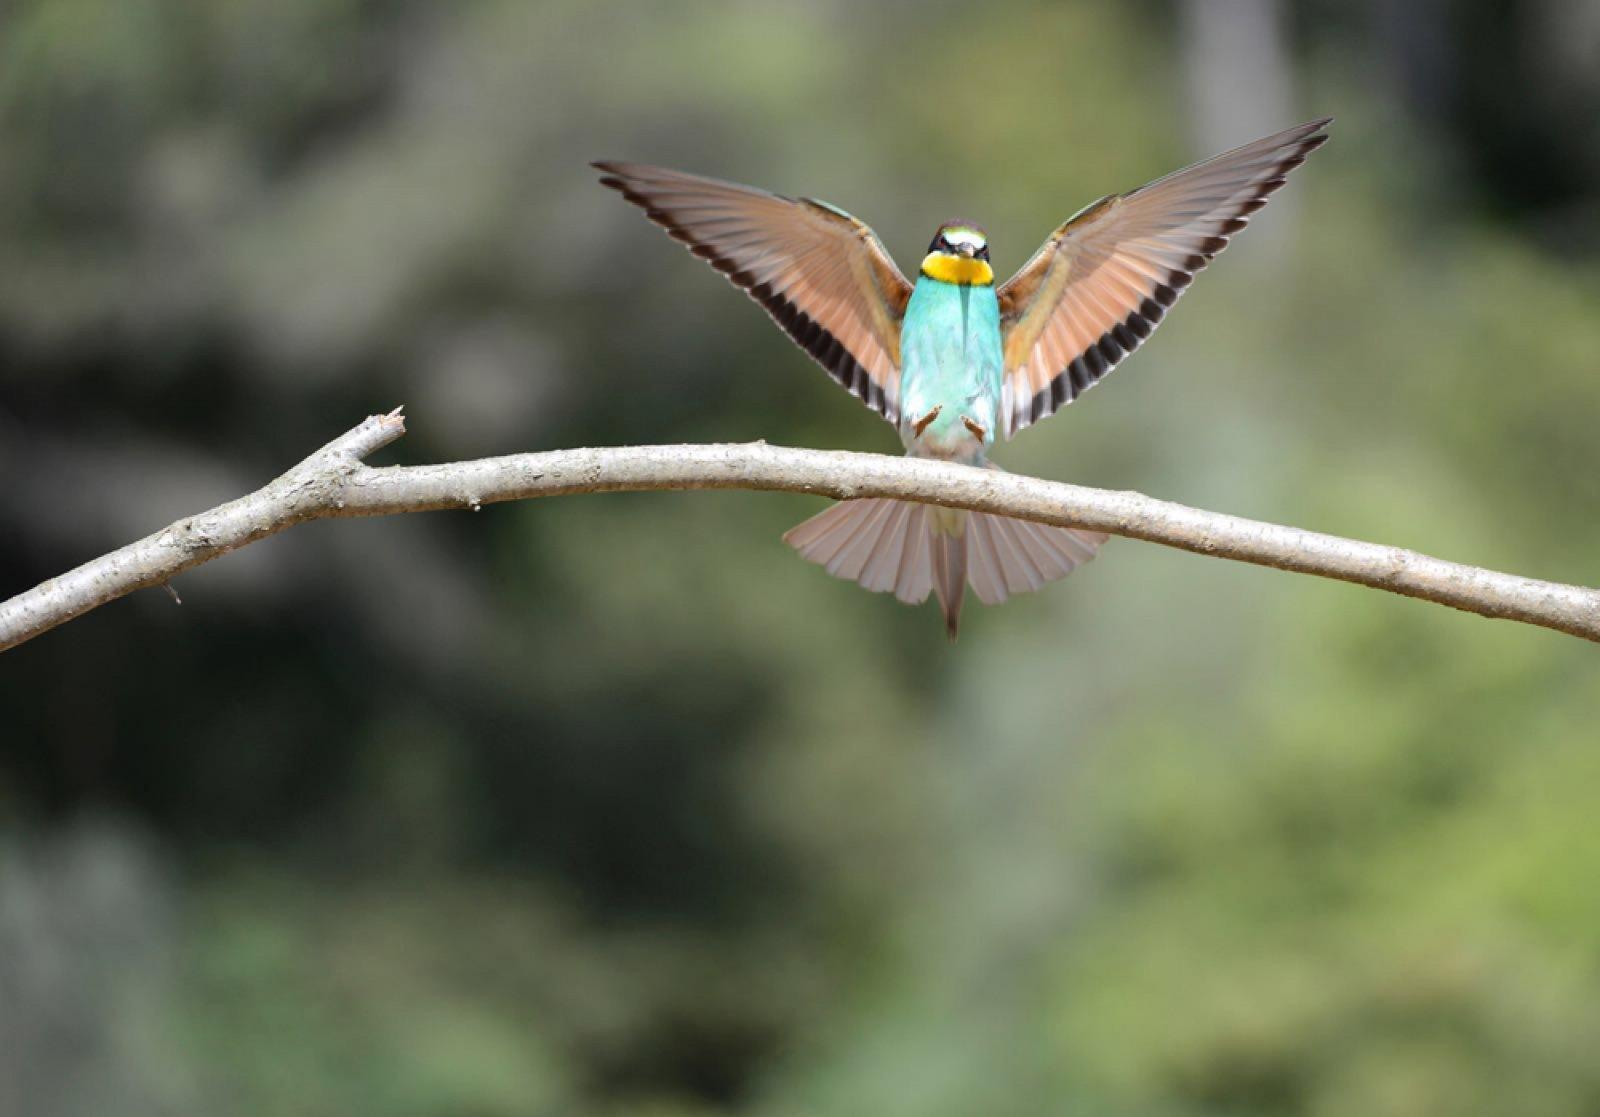 Ocell recuperat a Raventós i Blanc